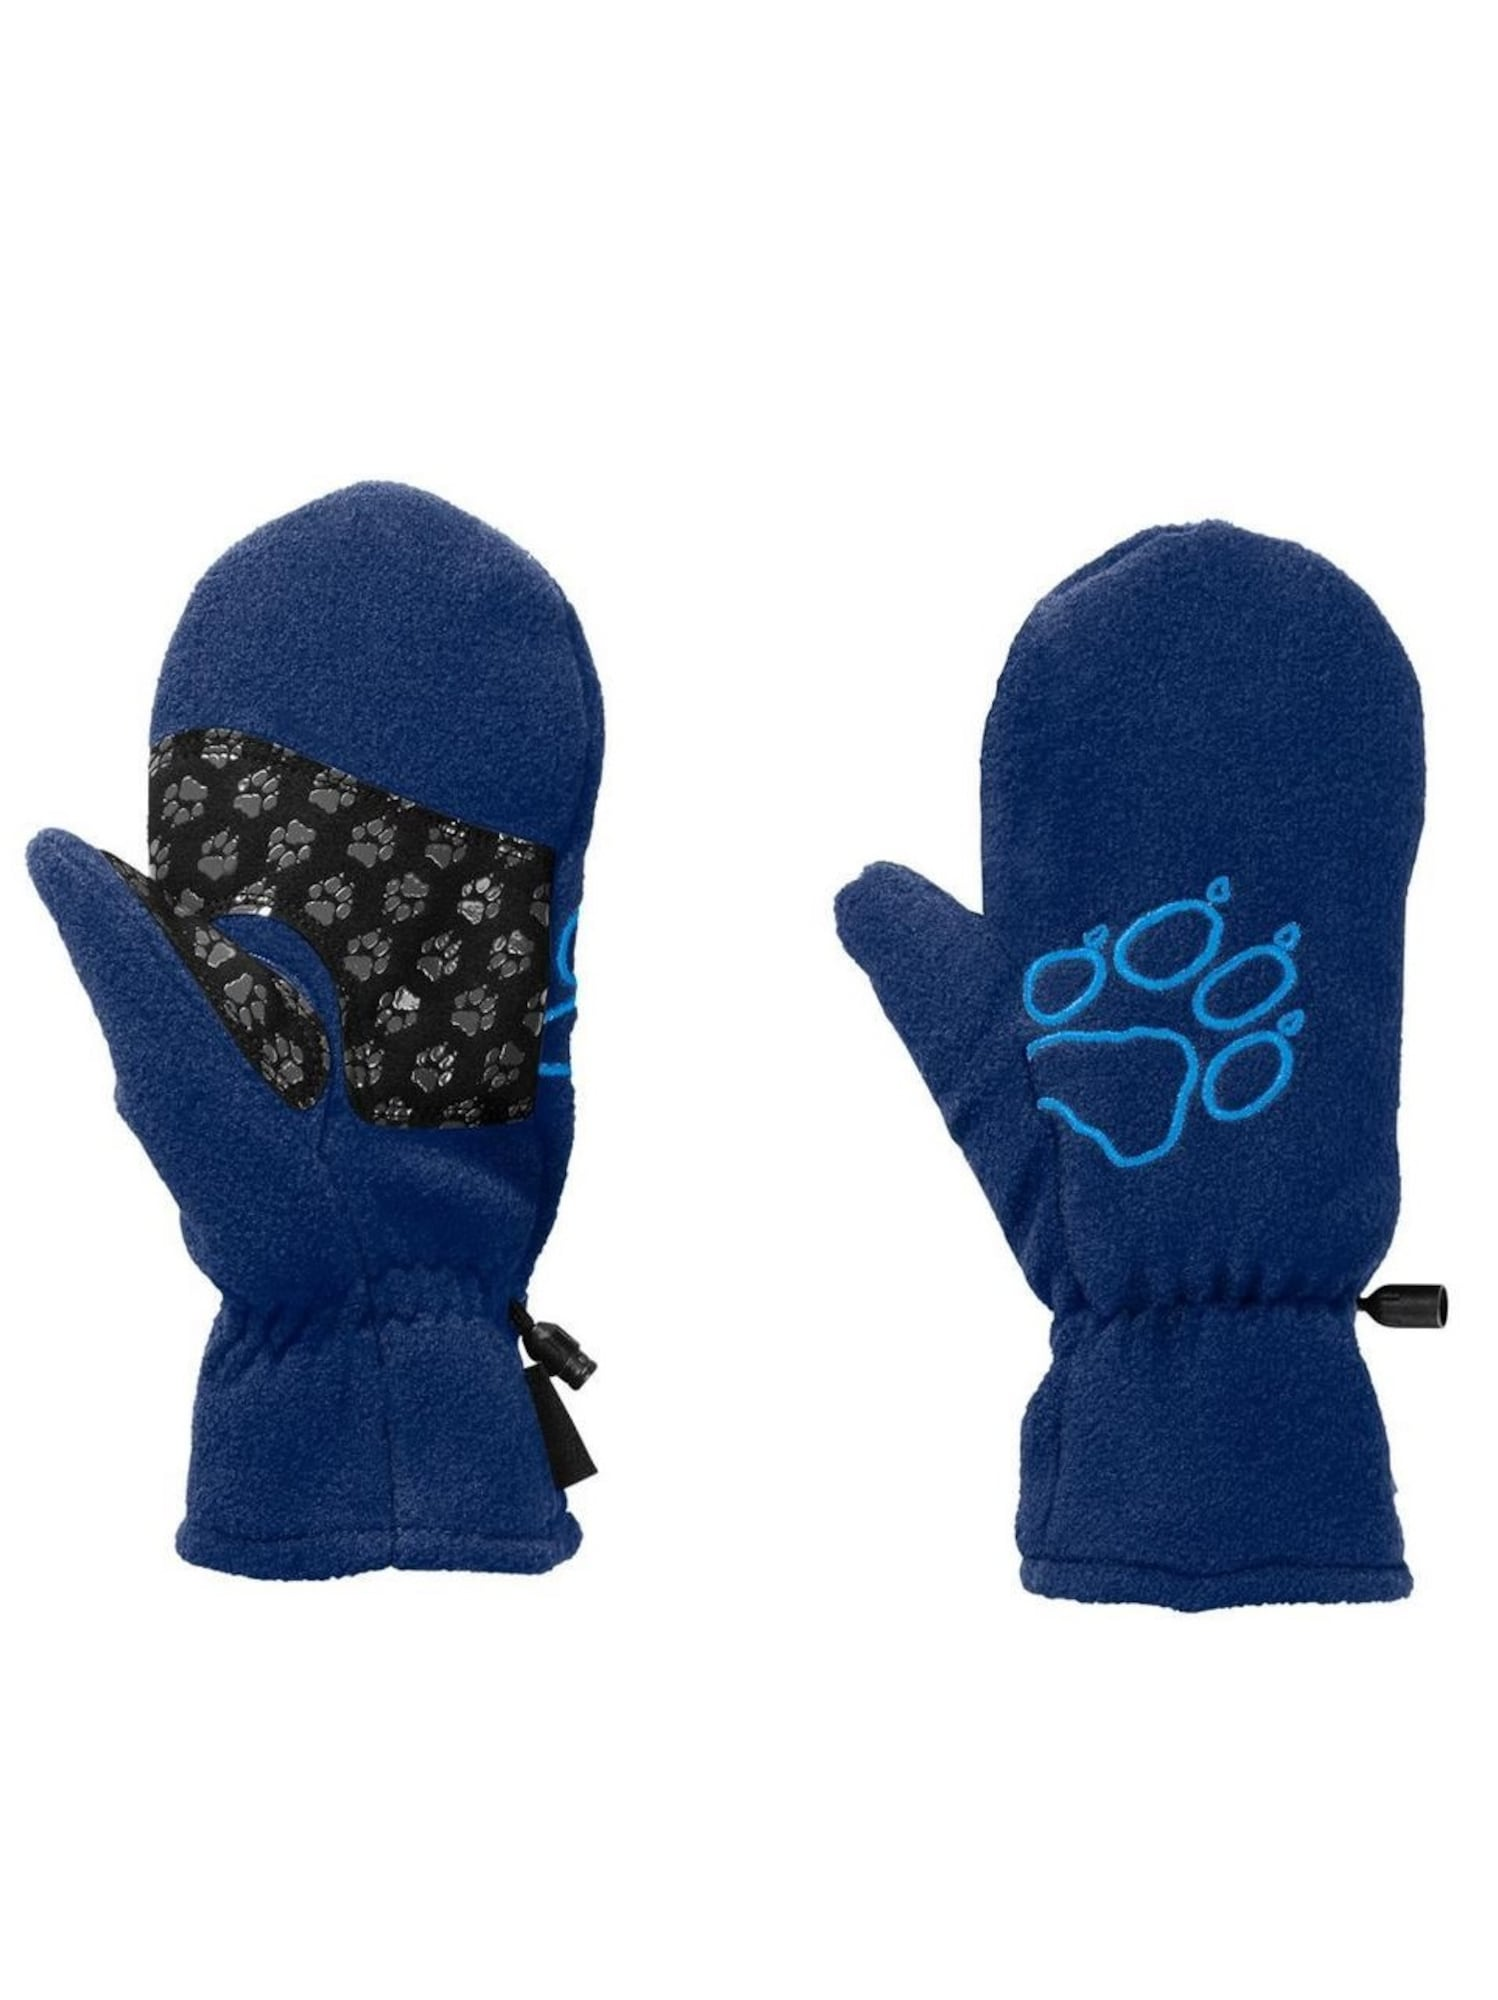 JACK WOLFSKIN, Jongens Sporthandschoenen, blauw / zwart